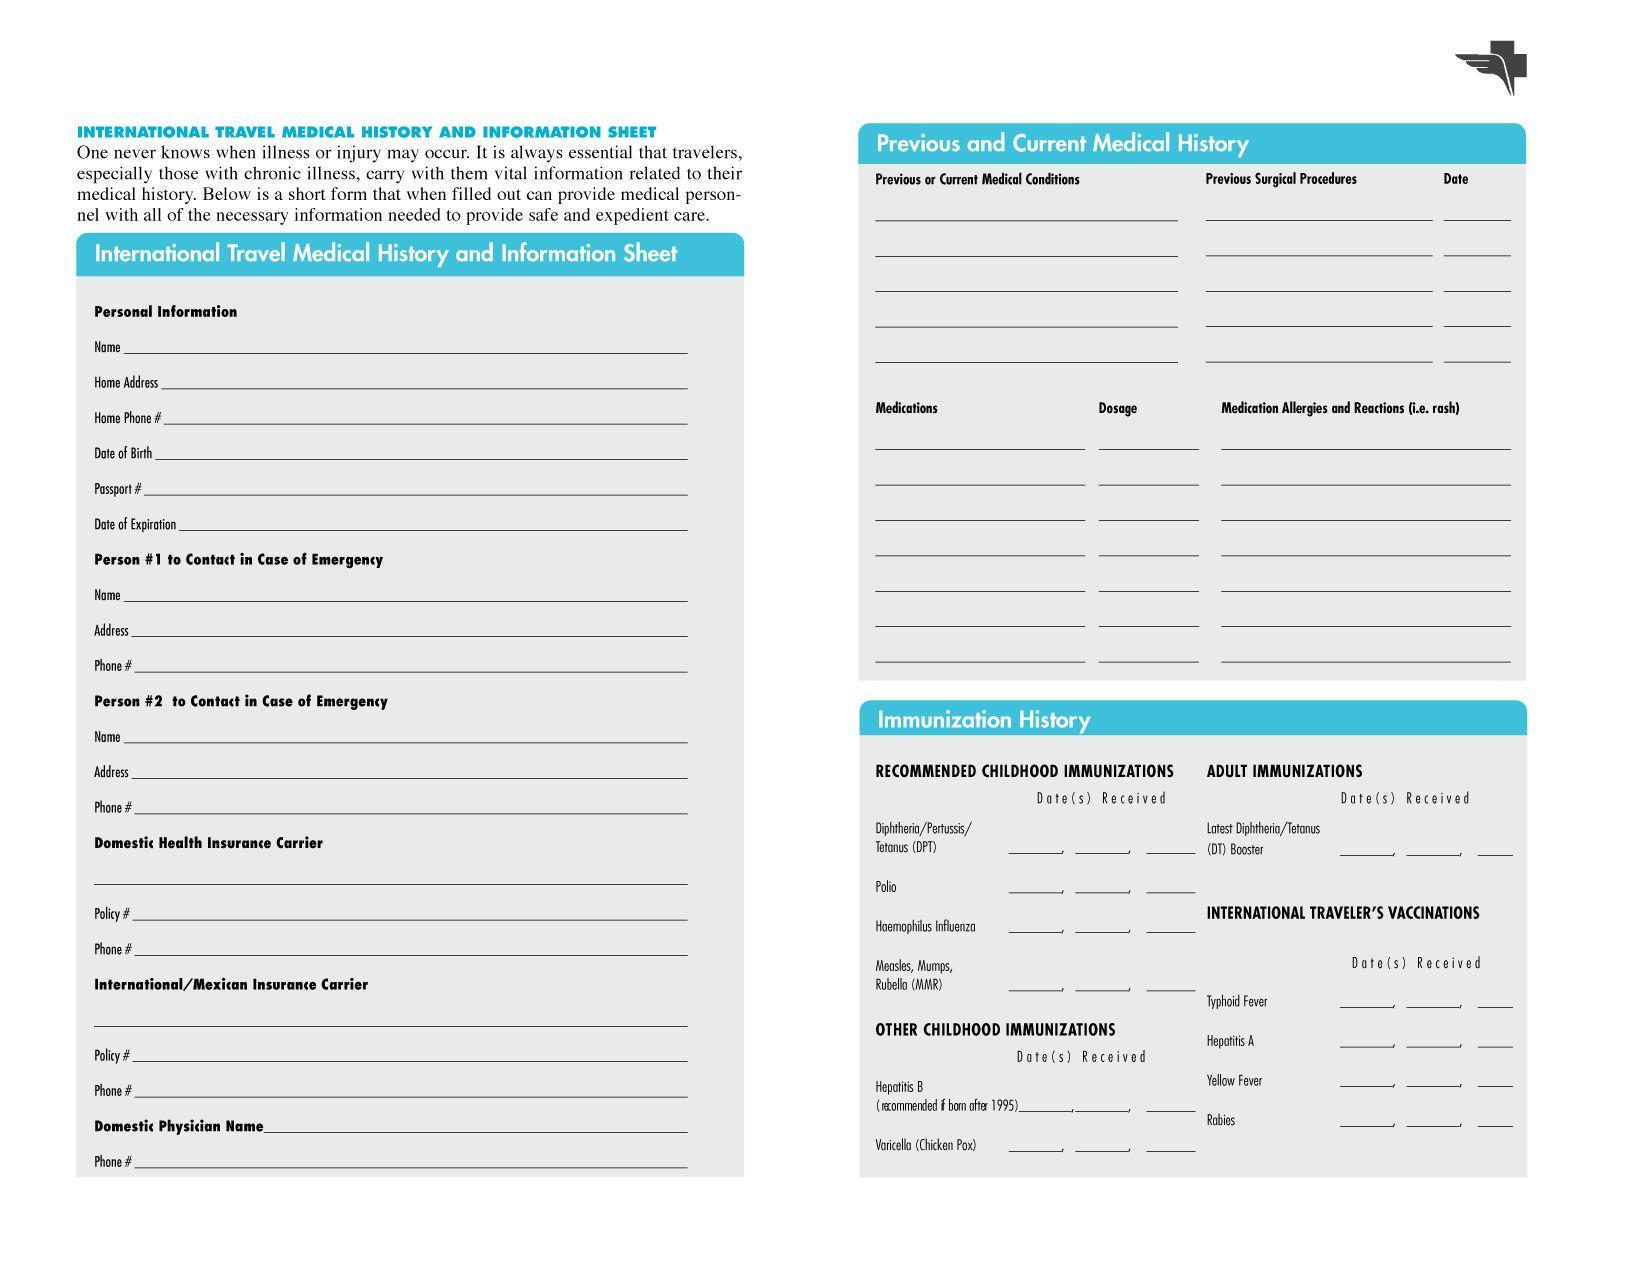 Free Printables | Free Printable Family Medical History Forms - Free Printable Family History Forms